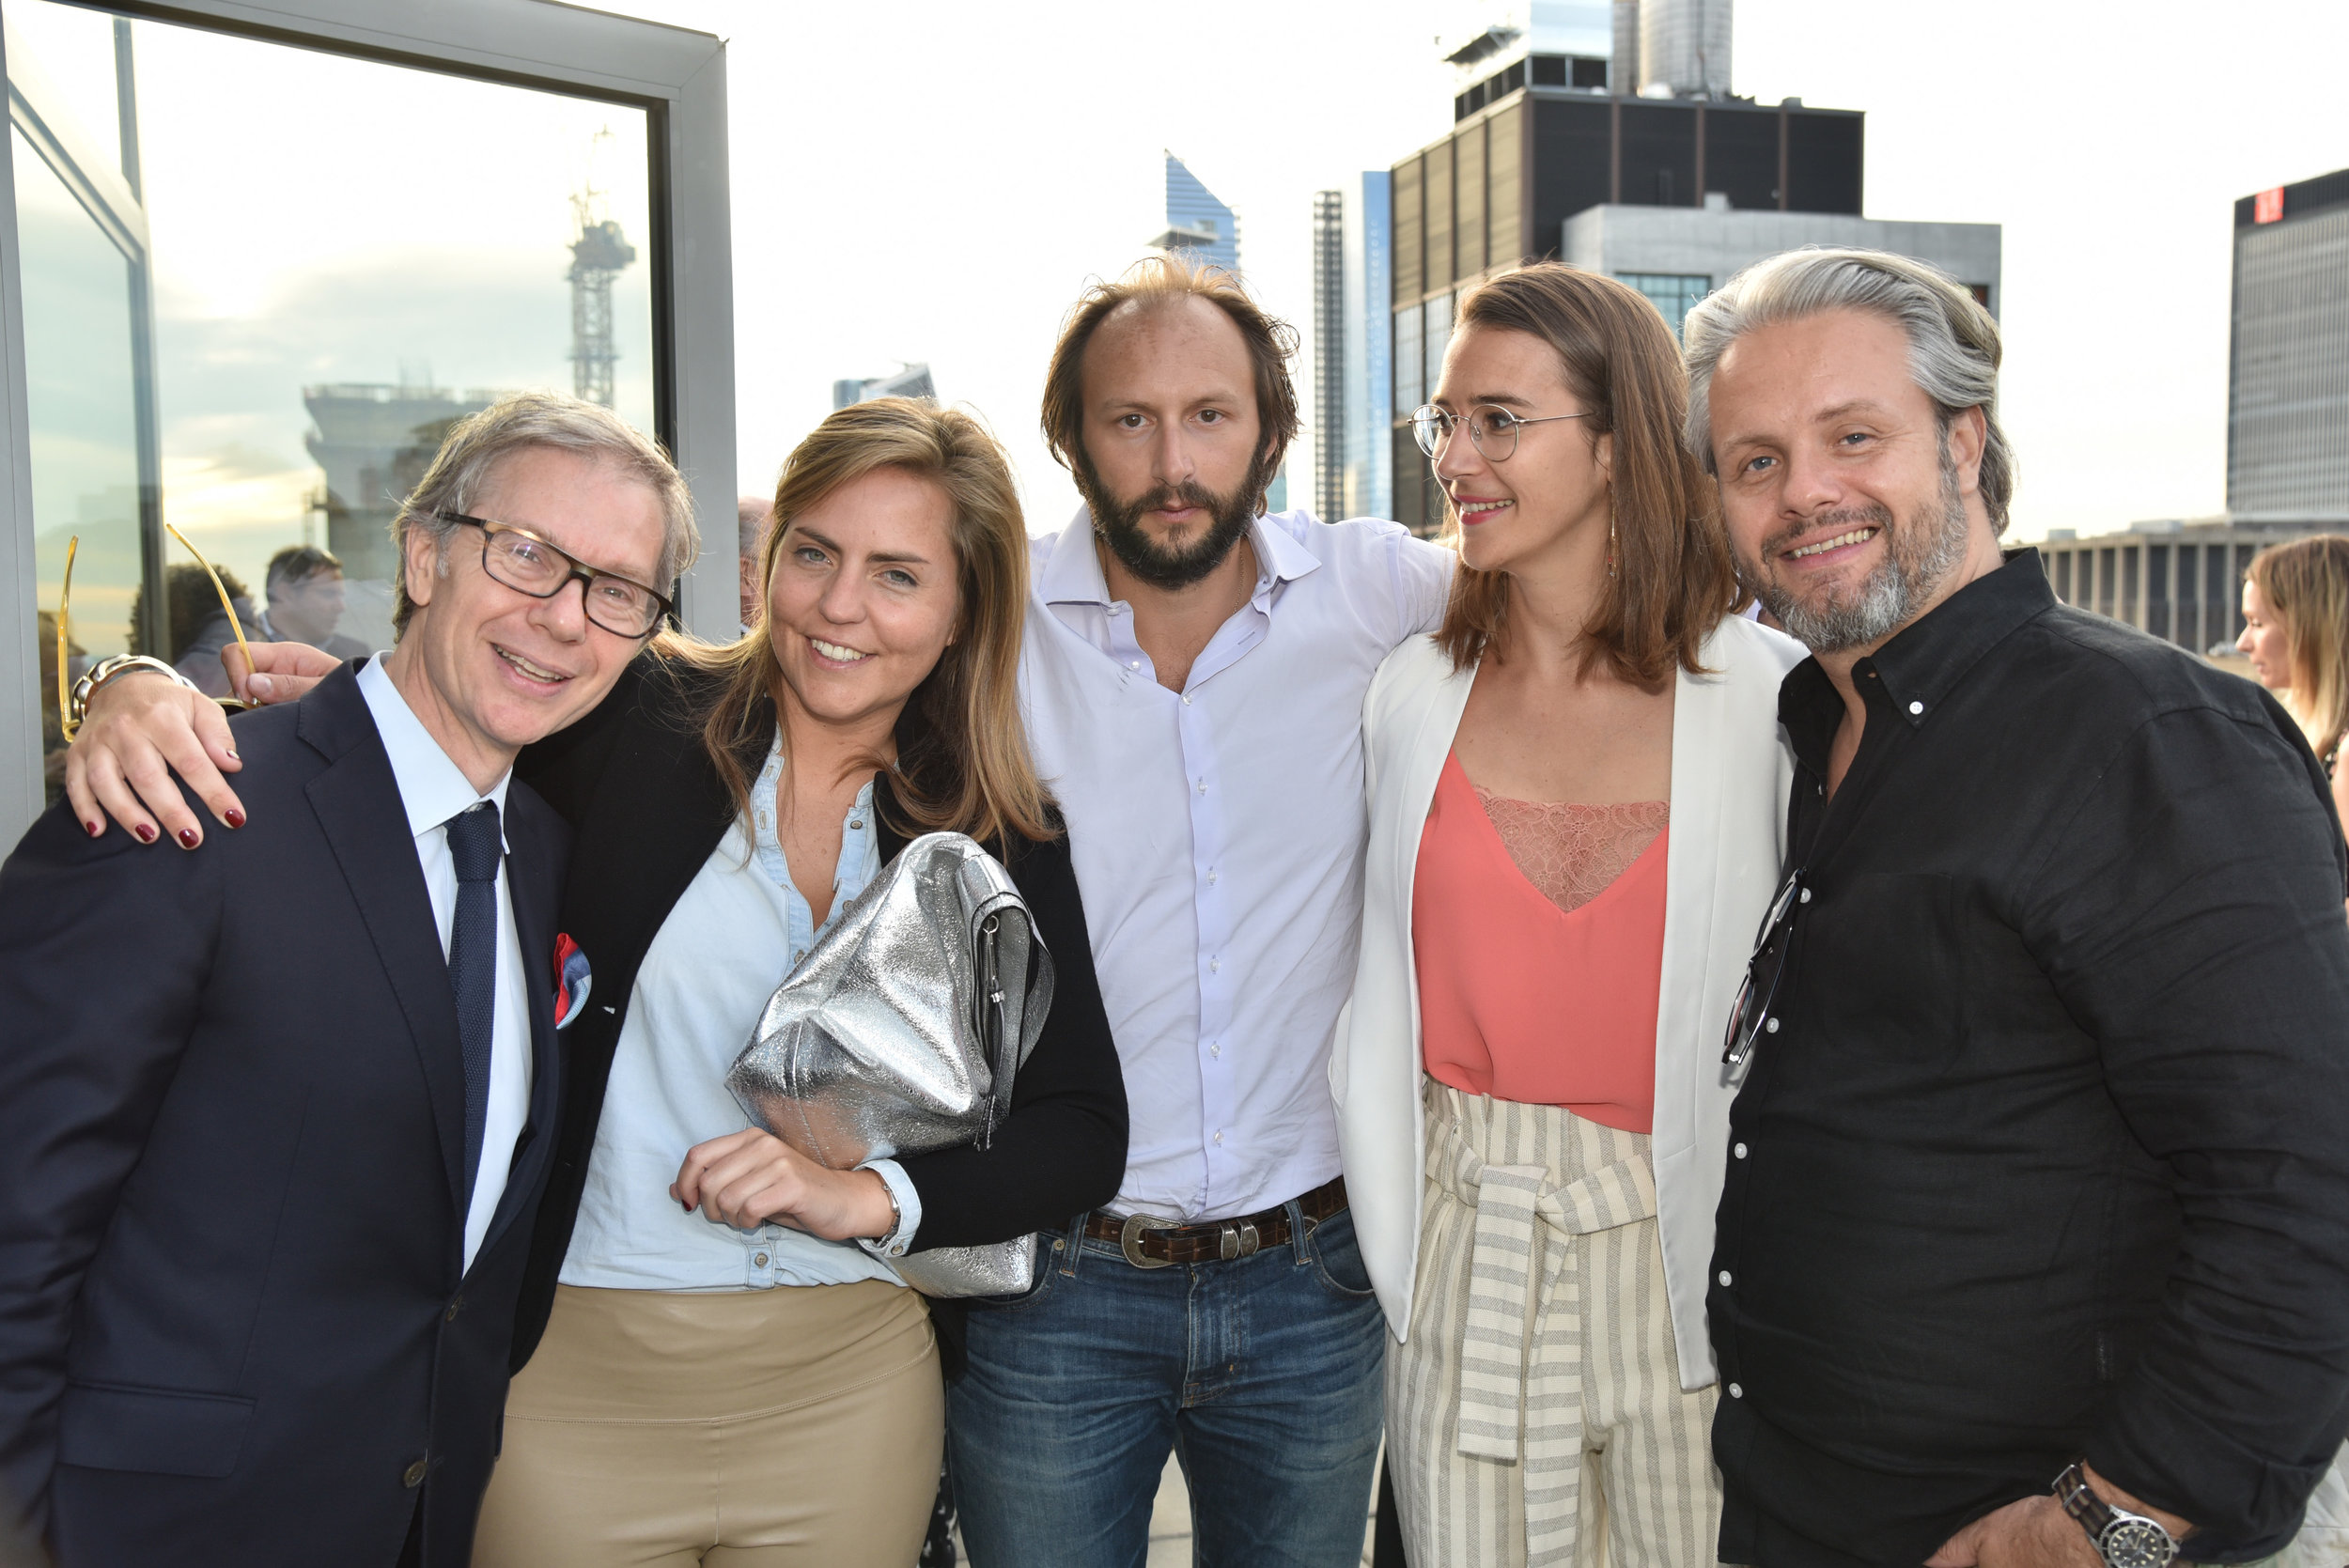 JC Agid, Margo Du Besset, Stanislas Thierry, Melite De Foucaud, Thomas Lambert.